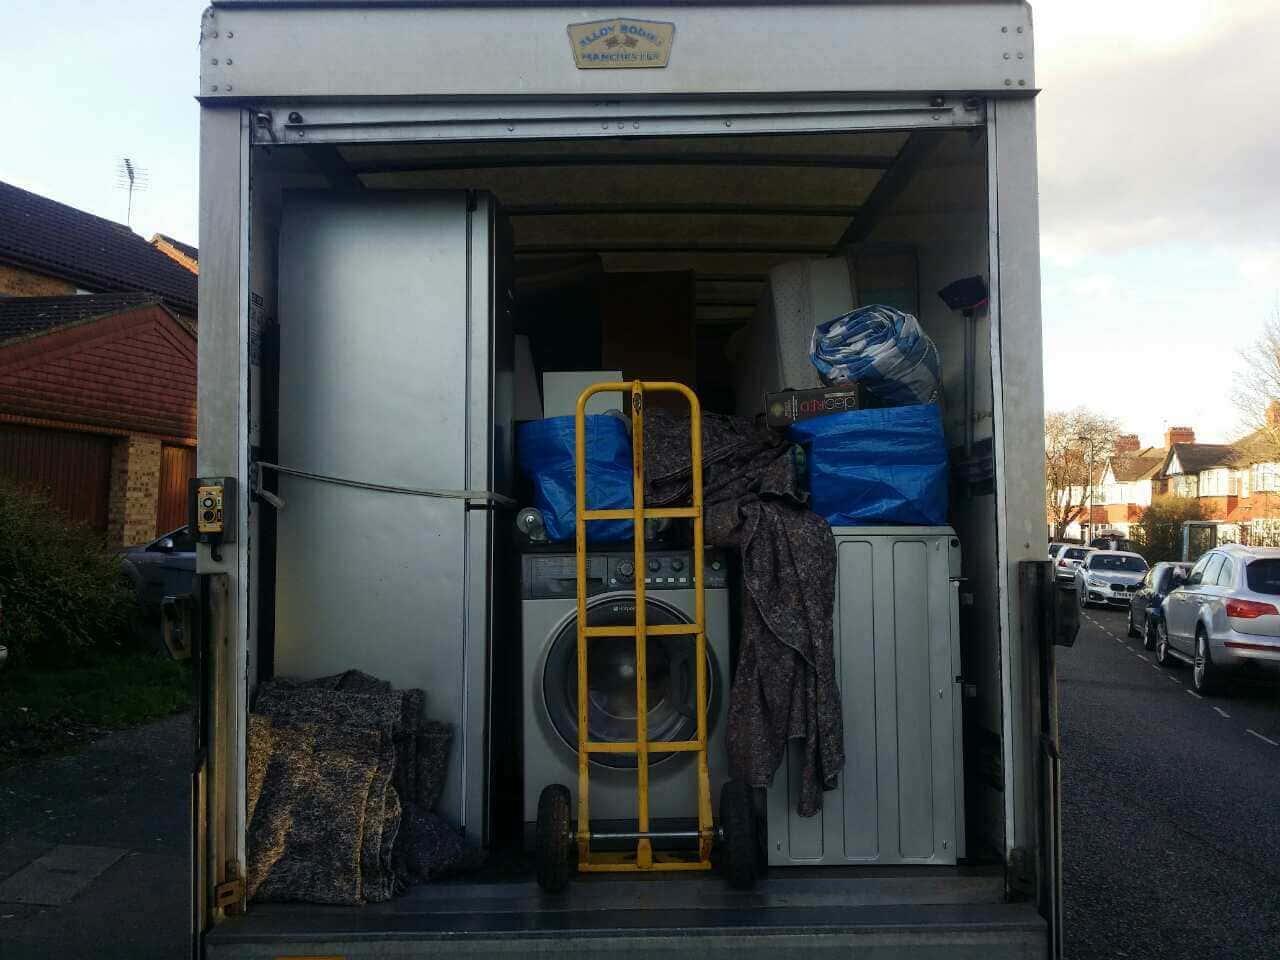 N2 van for hire in East Finchley